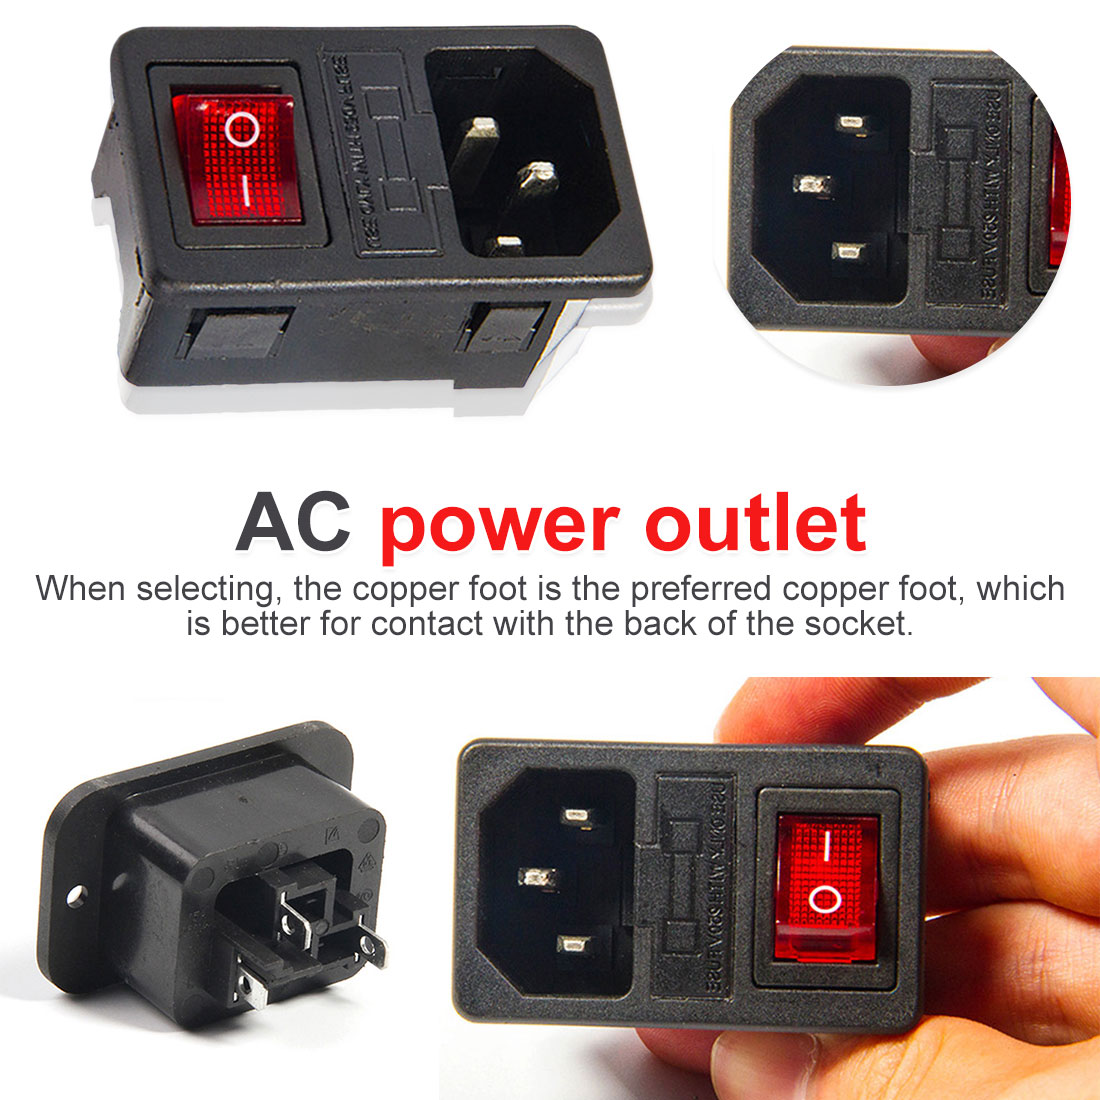 IEC 320 C14 Inlet Power Socket Fuse Switch Power socket red light power rocker switch connector plug power socket,